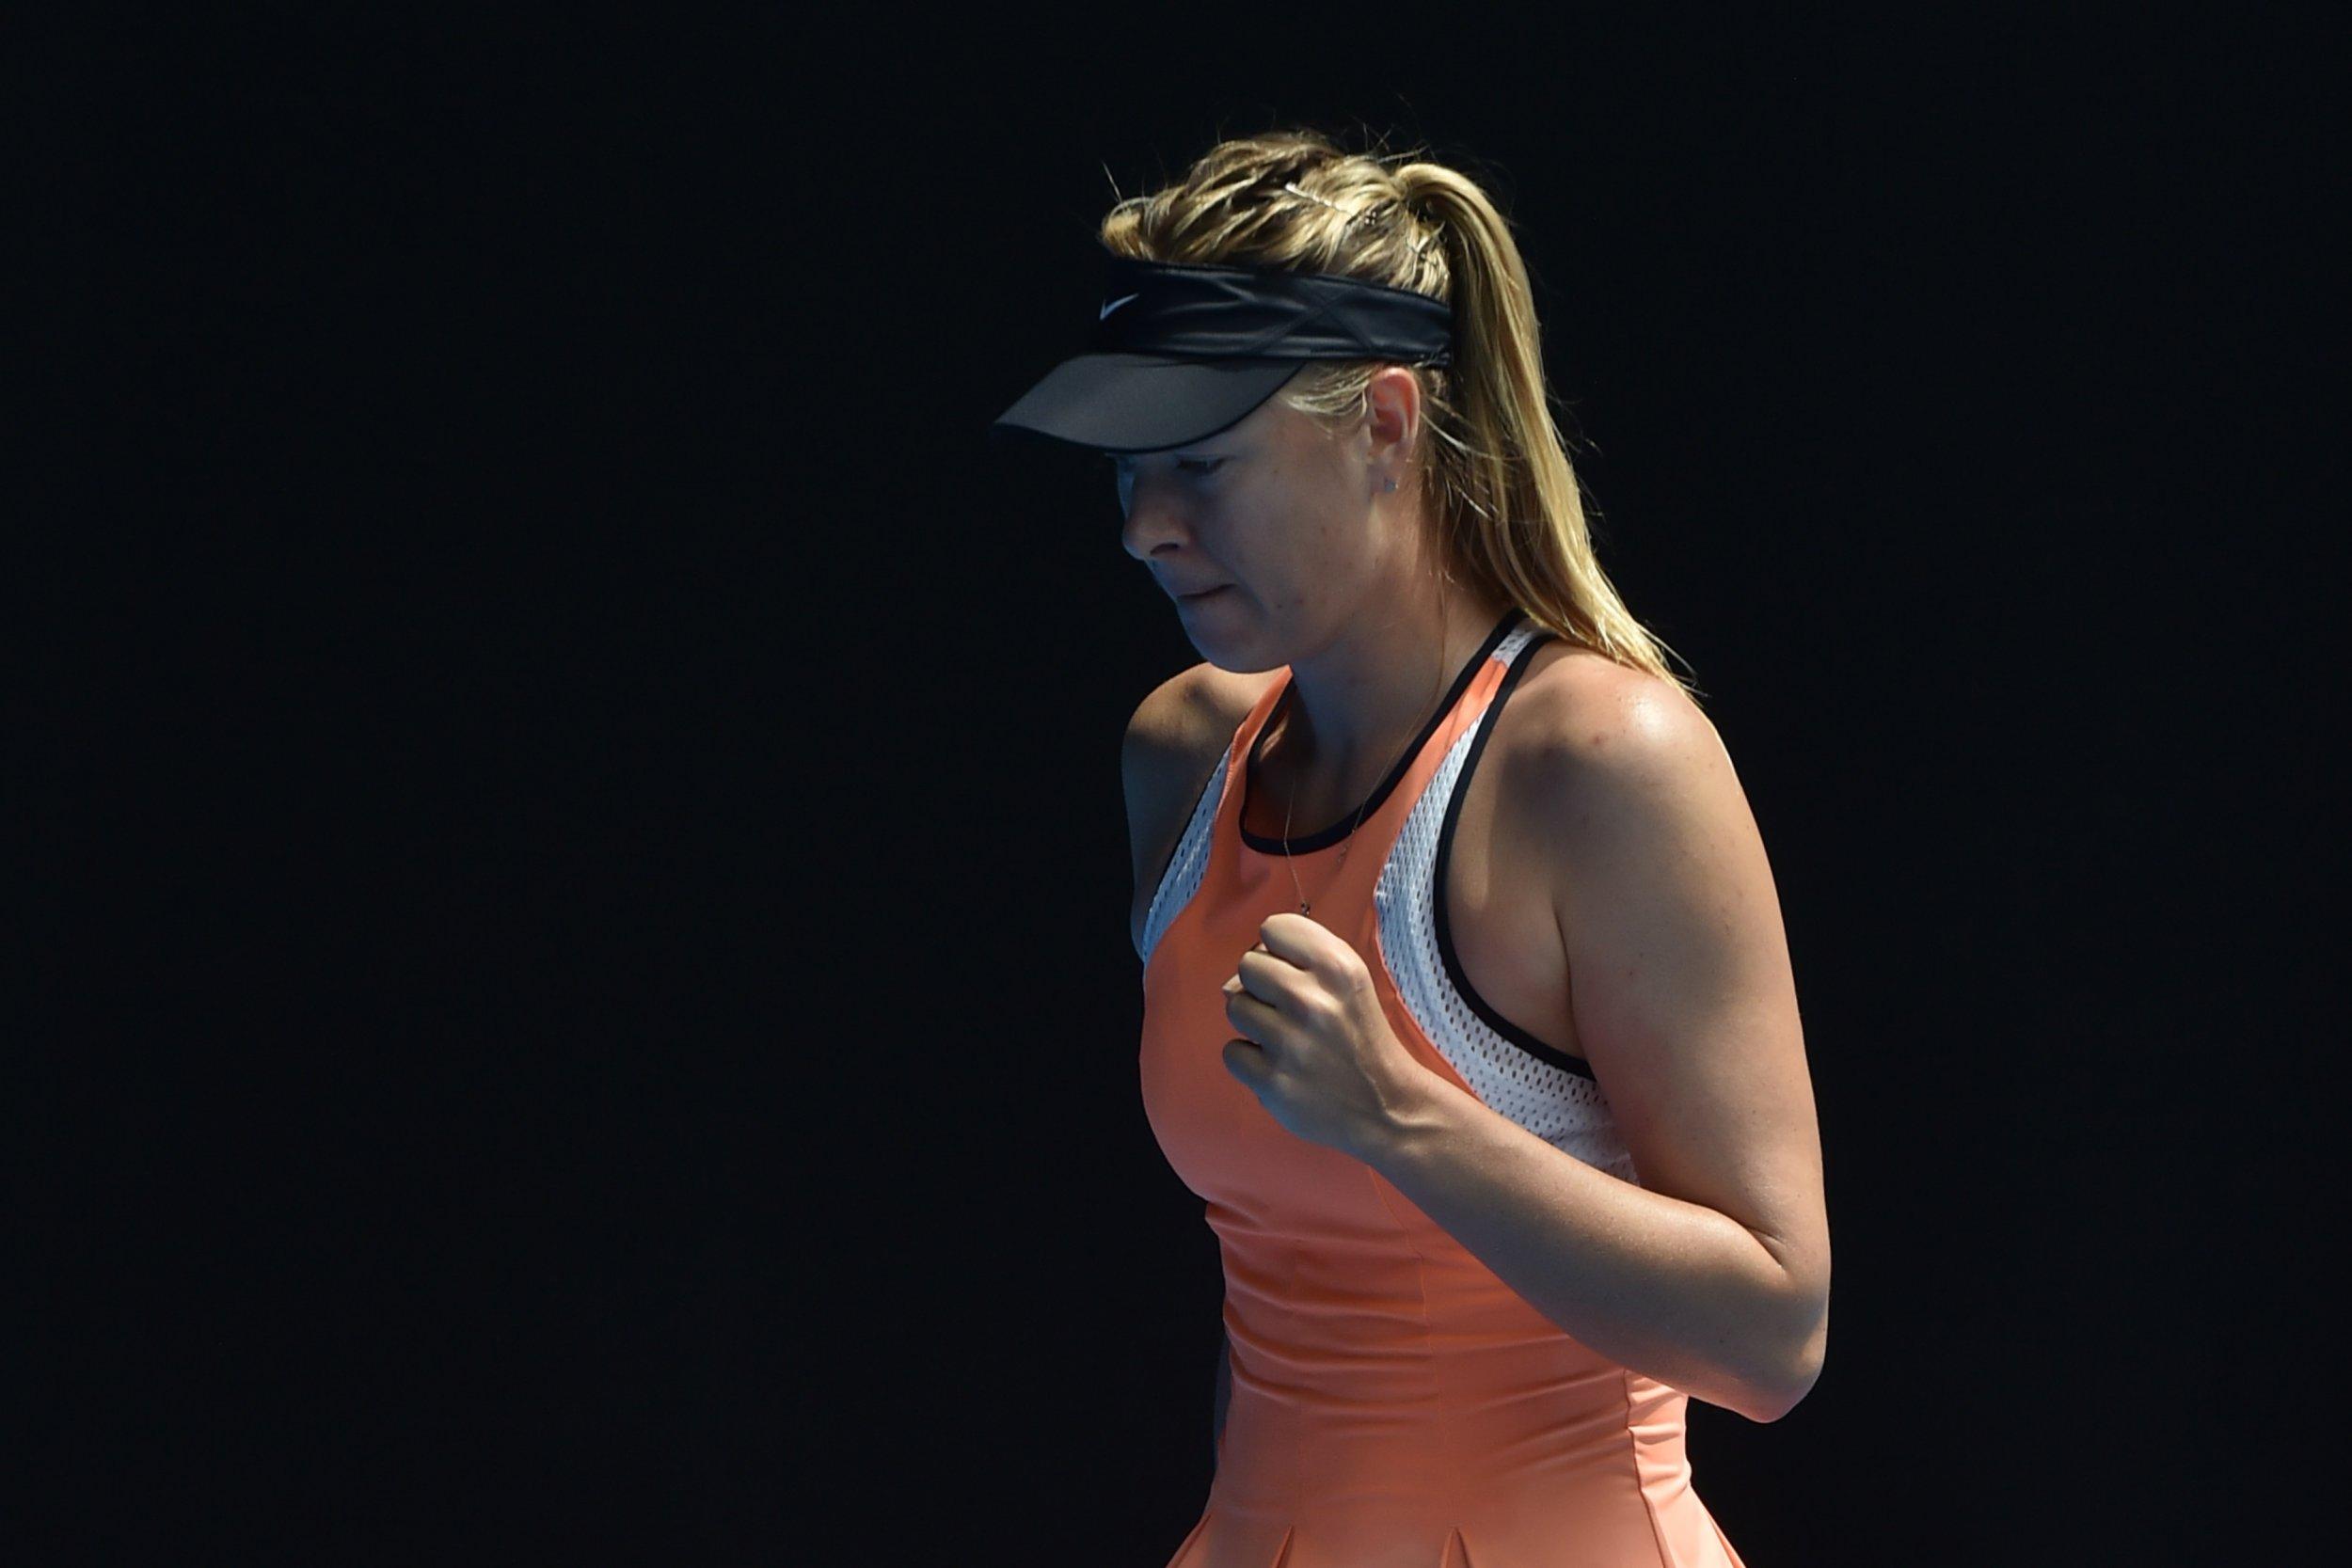 Maria Sharapova may benefit from a WADA rule change regarding meldonium.